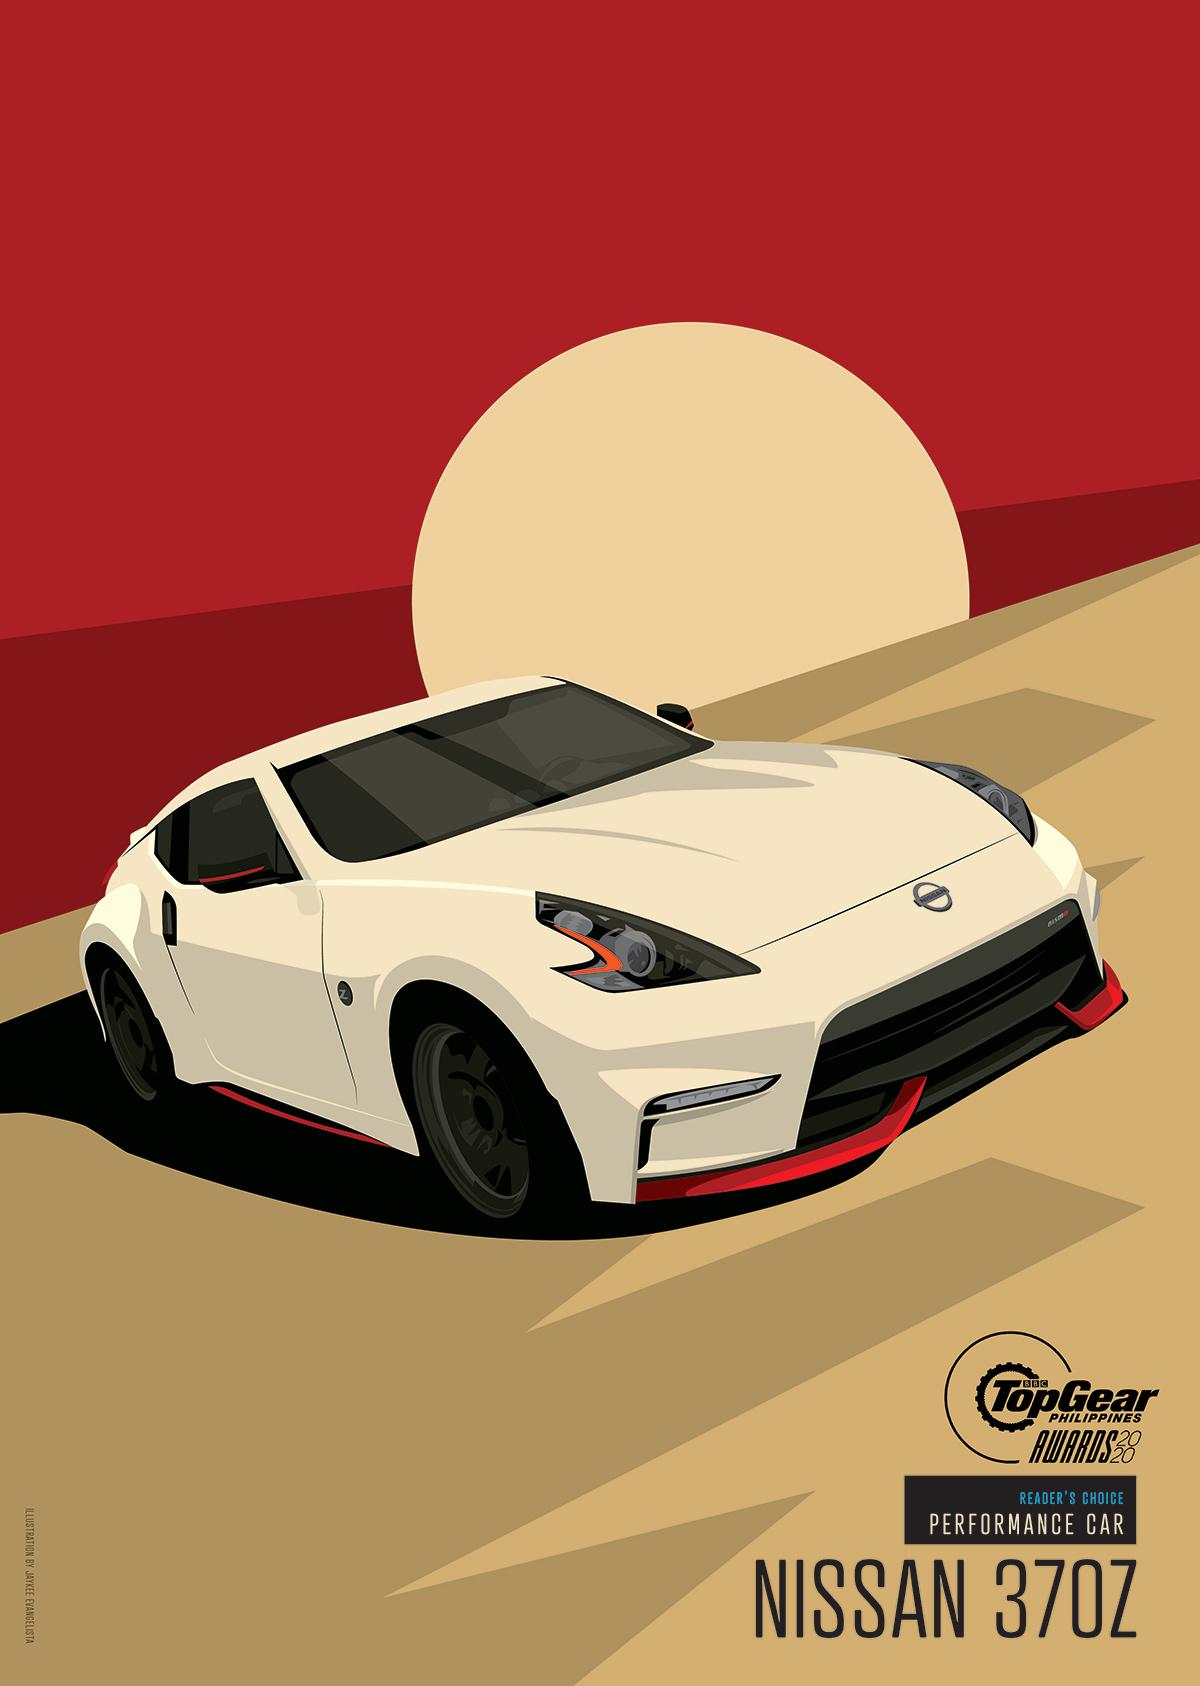 Top Gear Philippines' Reader's Choice: Performance Car: Nissan 370Z